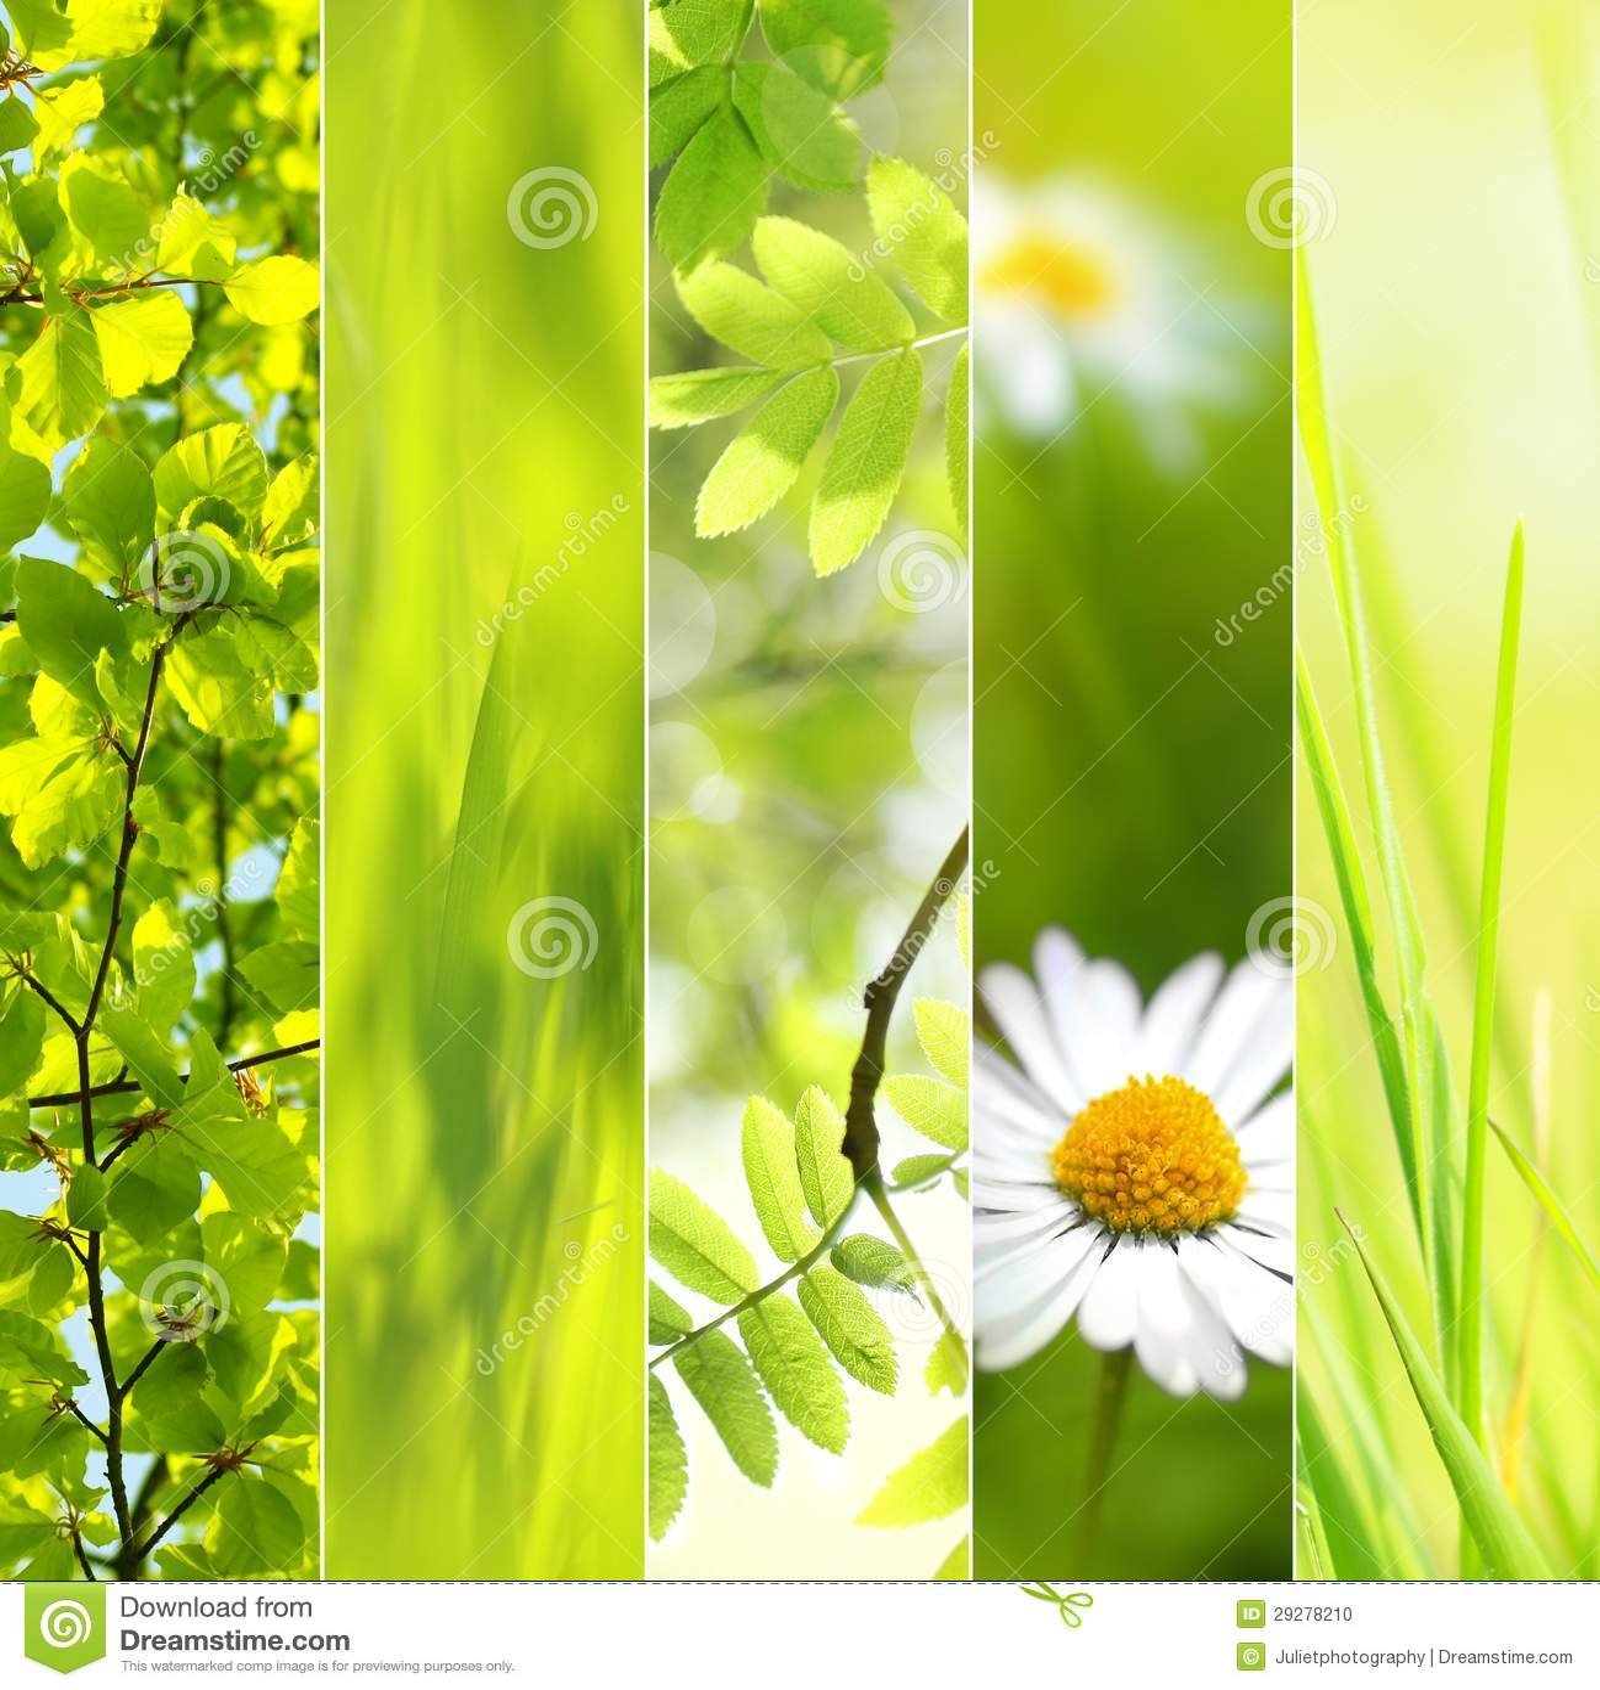 spring seasonal